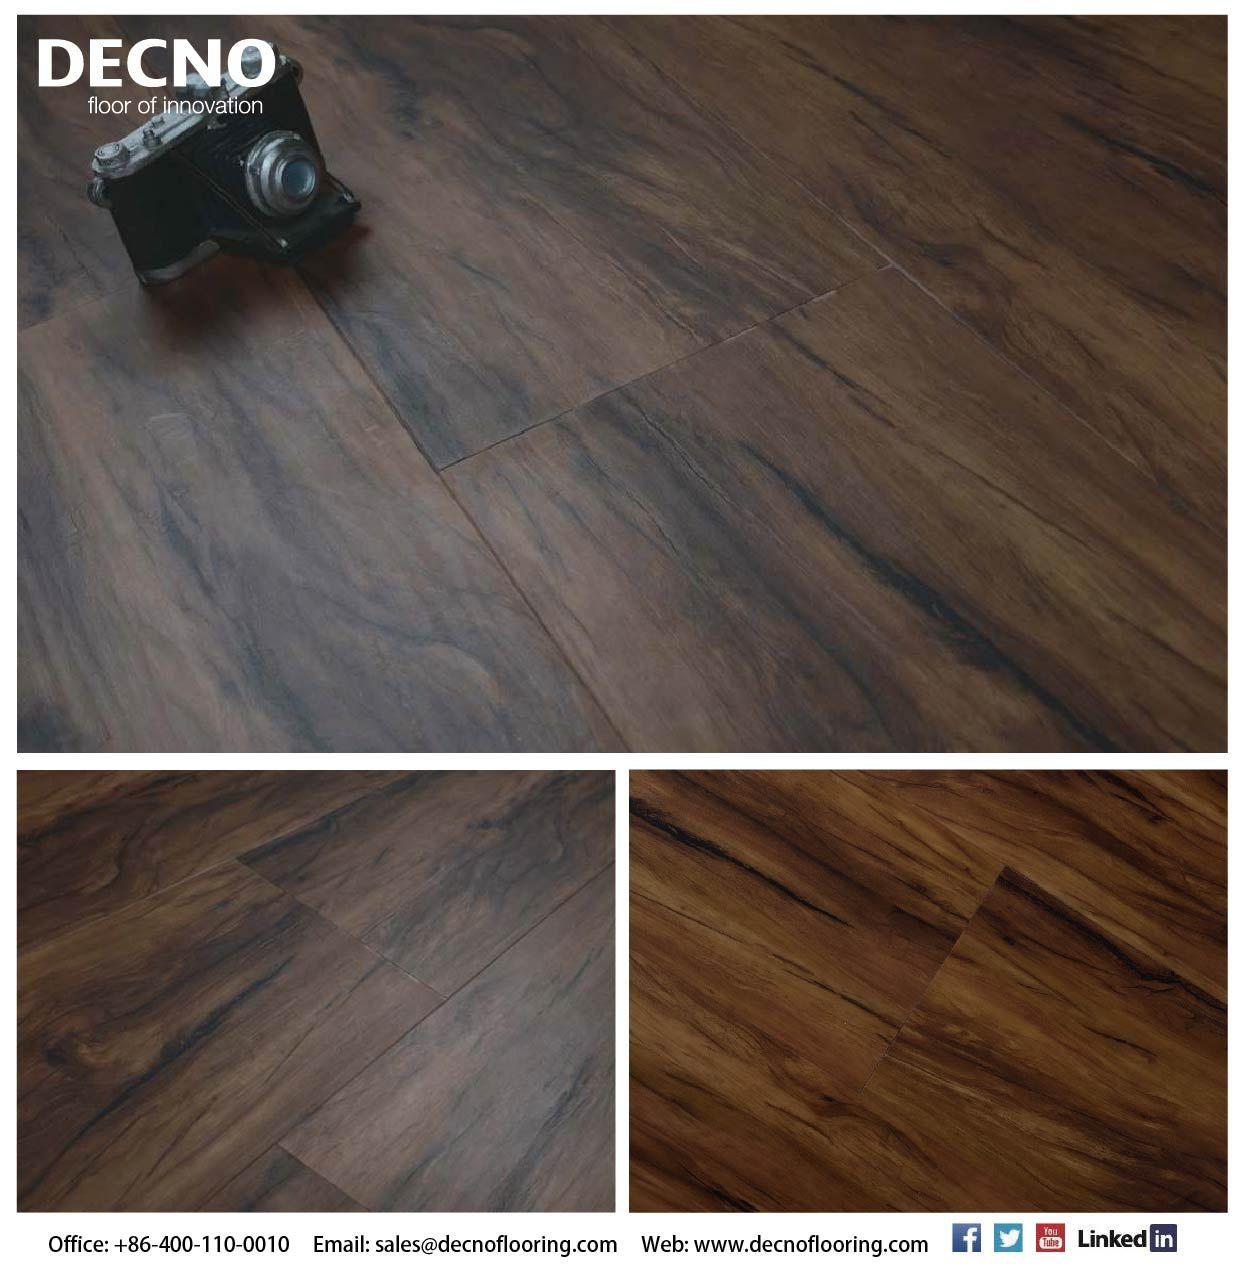 Spc Flooring Is An Upgrade Ofvinyl Flooring Products It Is